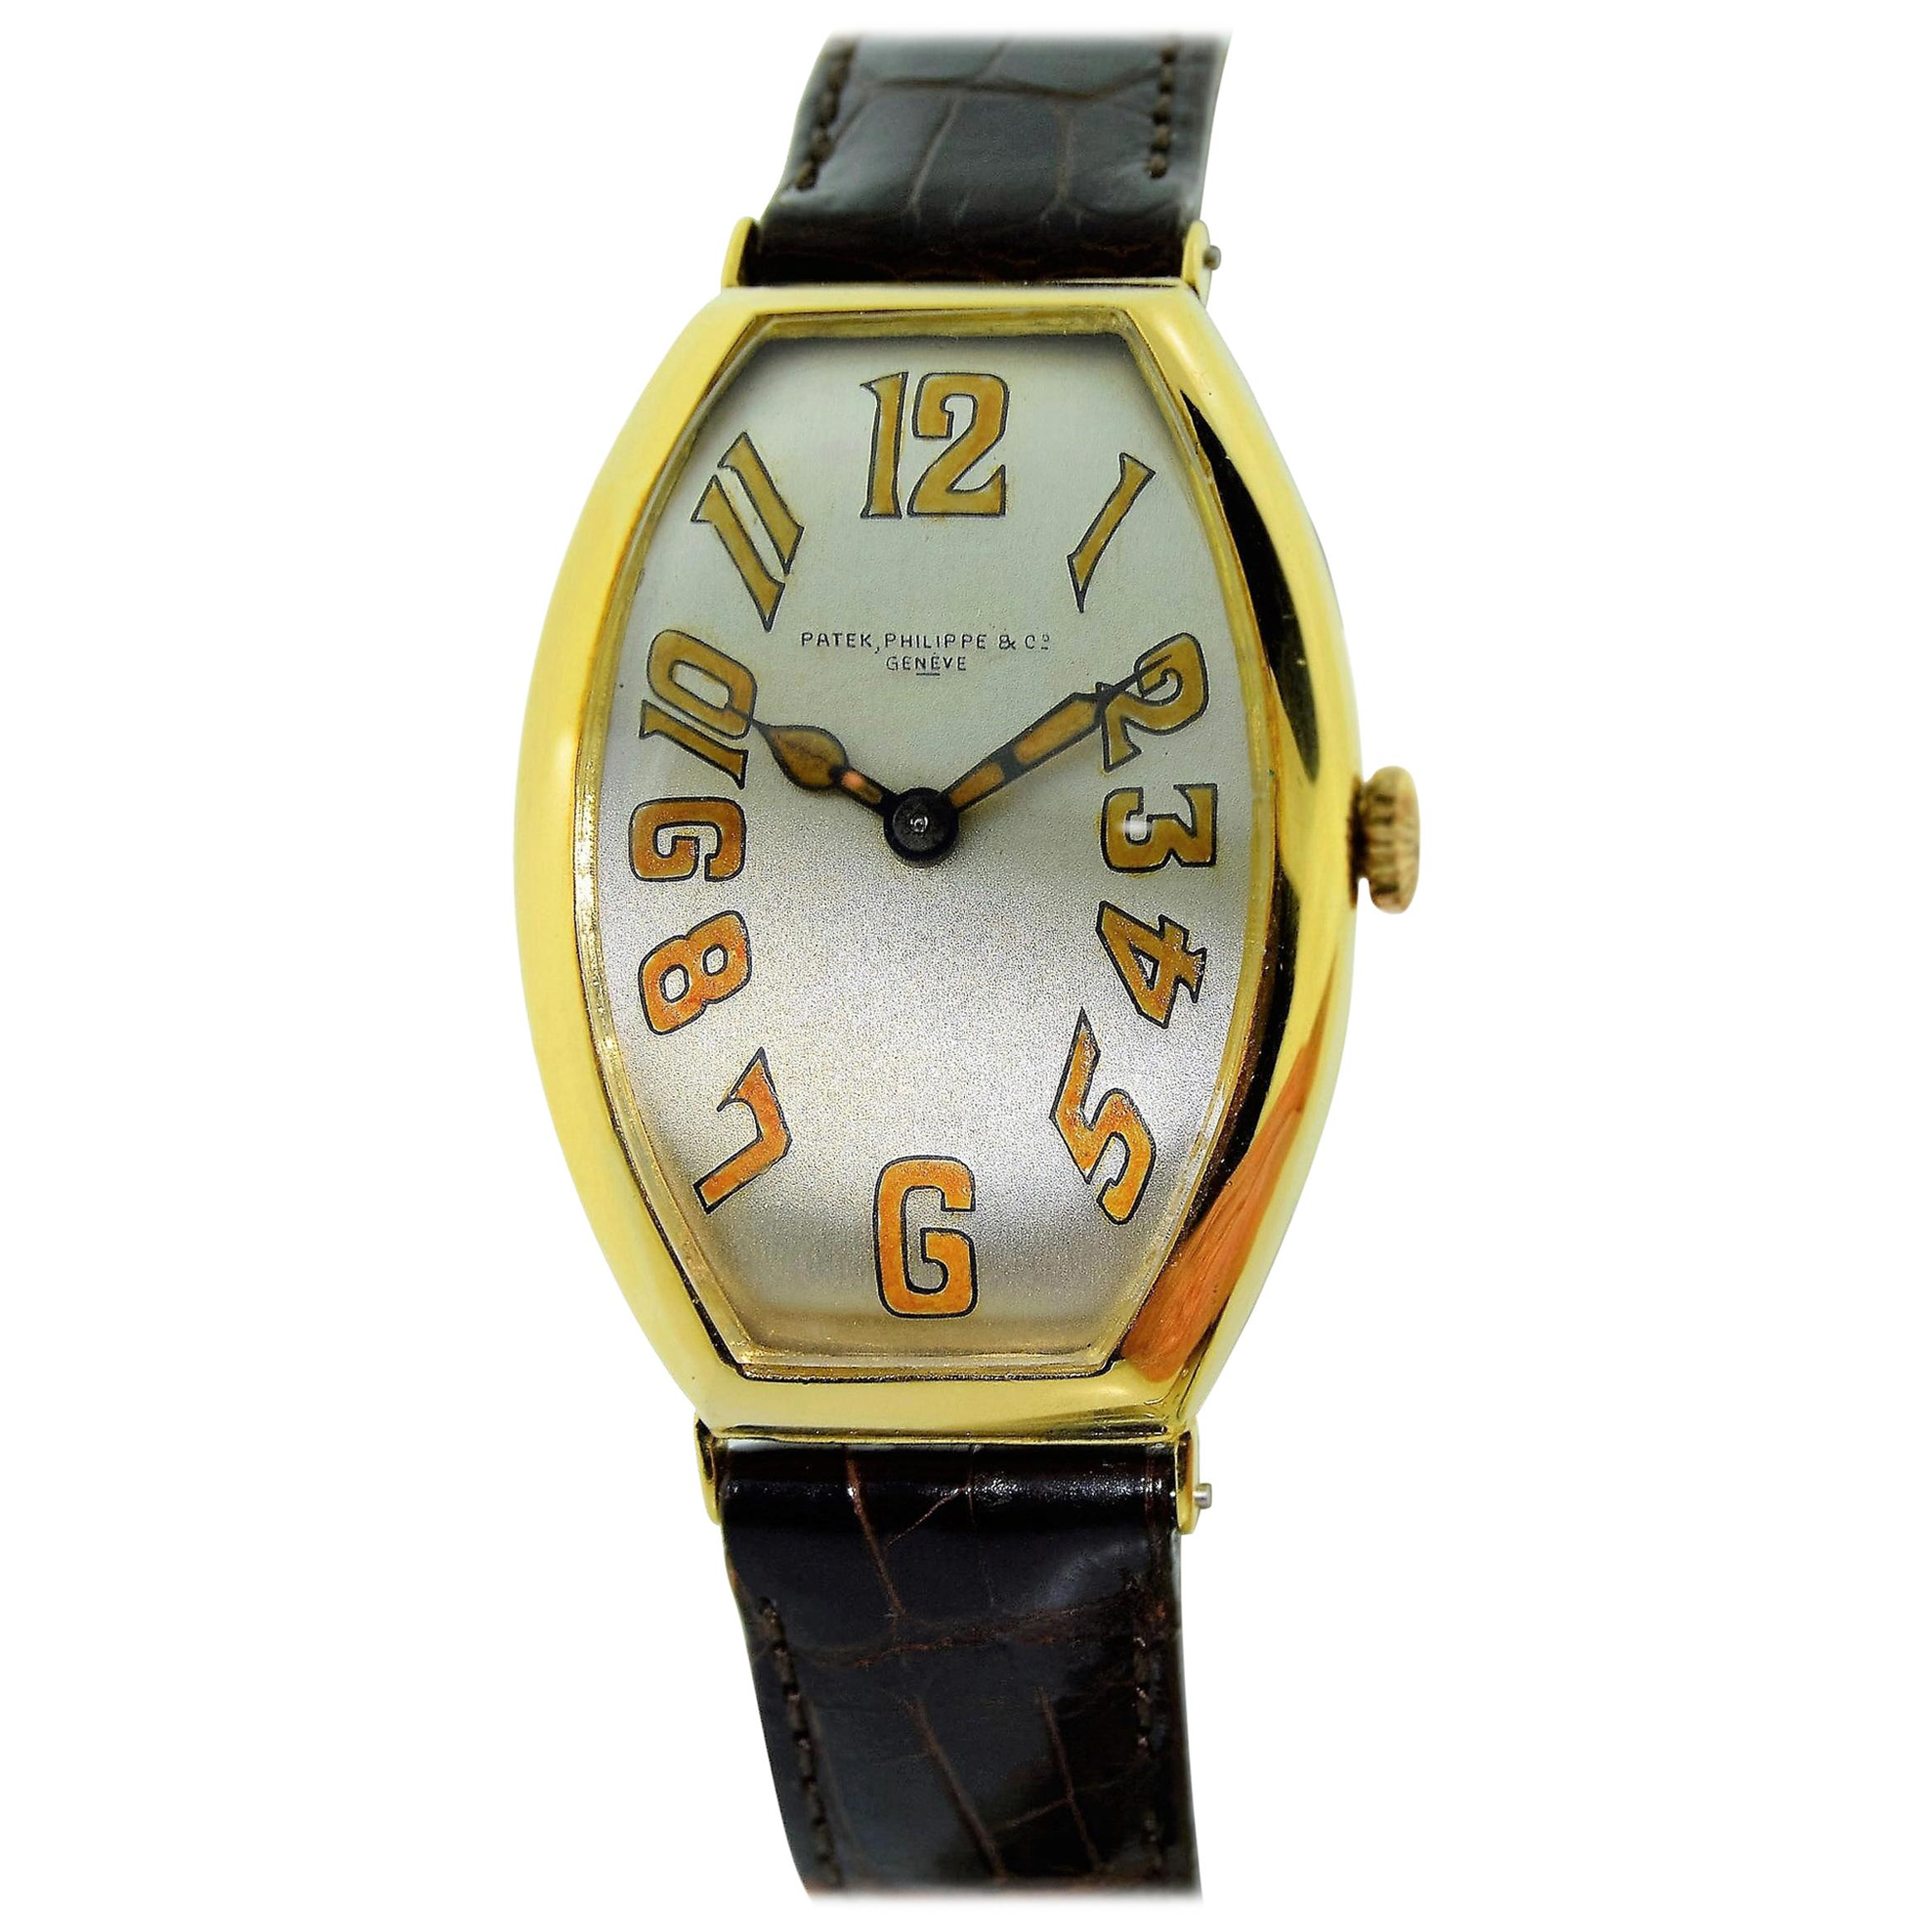 Patek Philippe 18kt. Yellow Gold Oversized Gondolo Manual Wind Watch from 1923